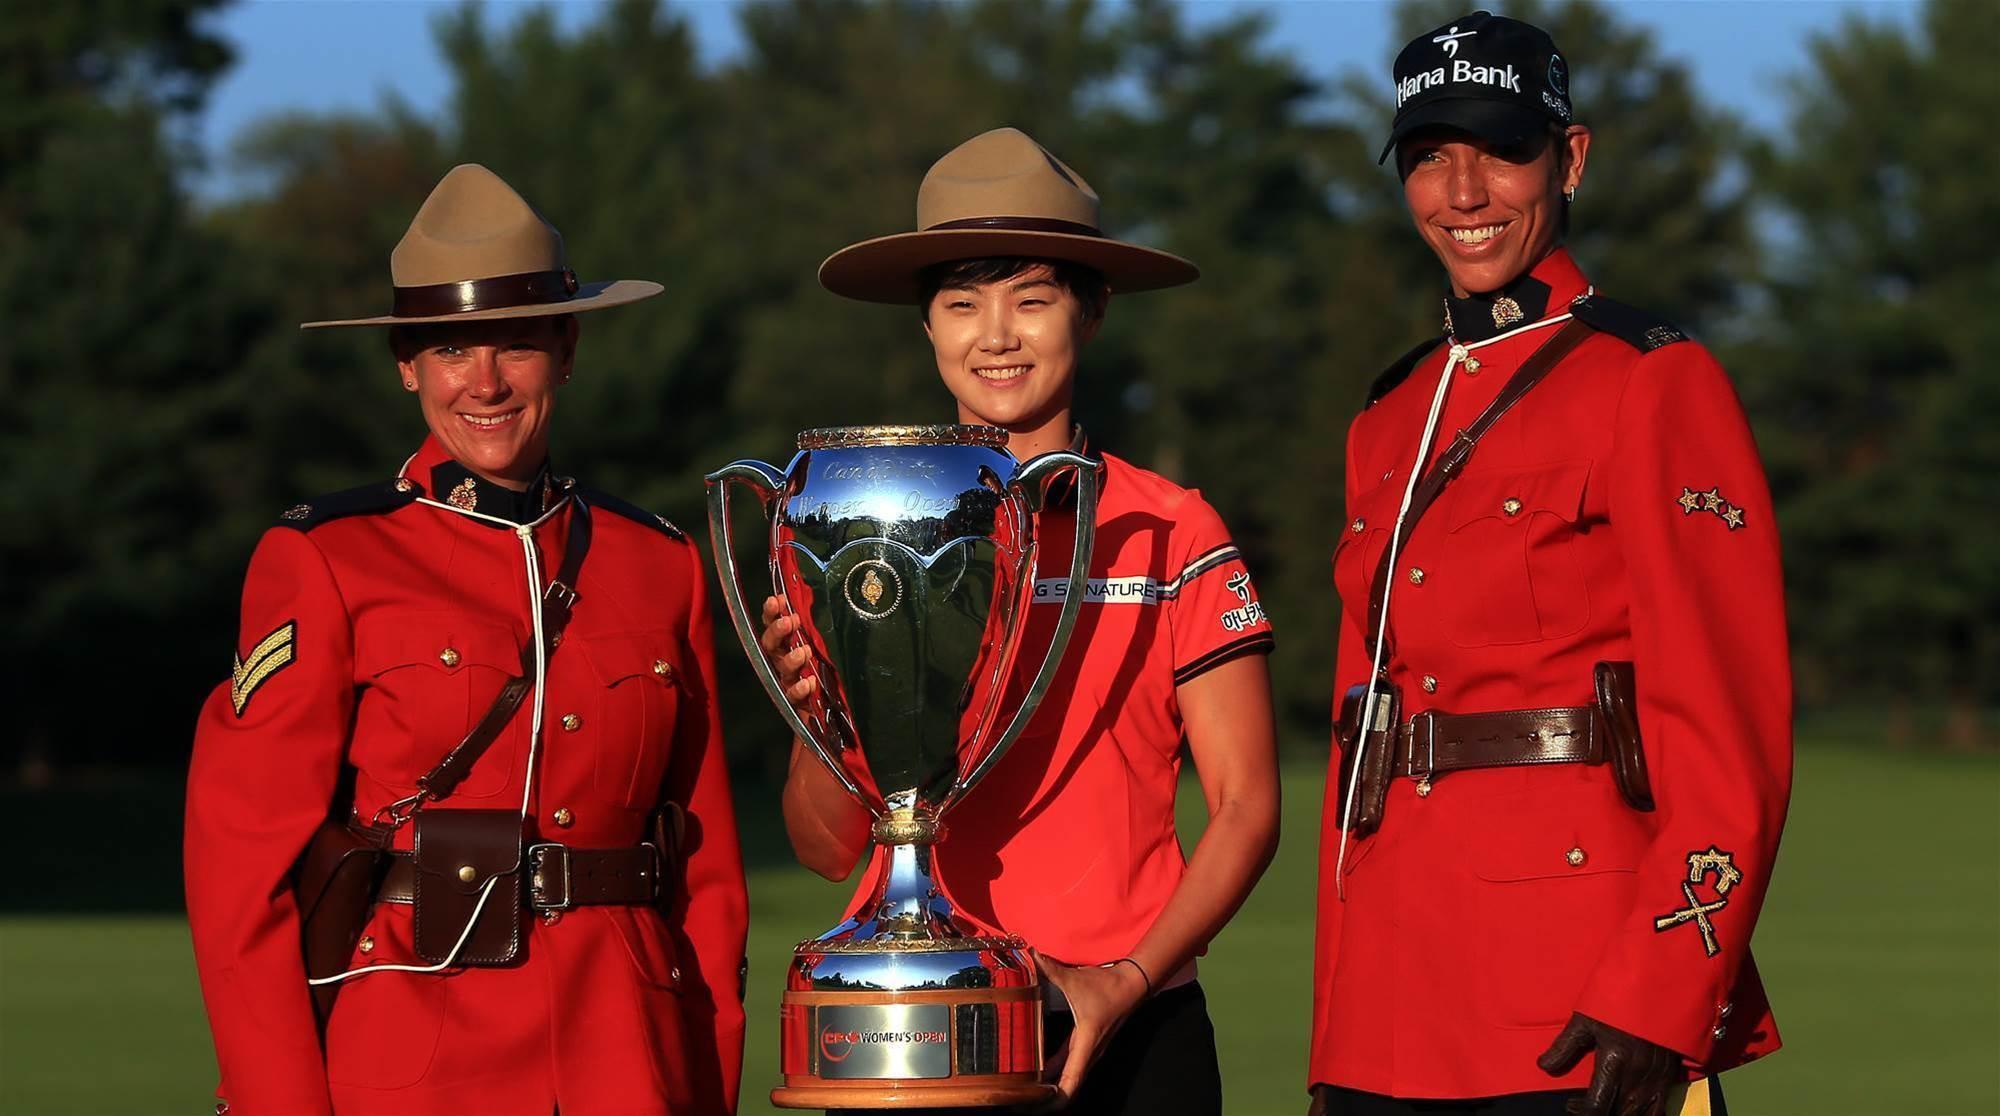 LPGA TOUR: Sung Hyun Park storms home to win the CP Women's Open